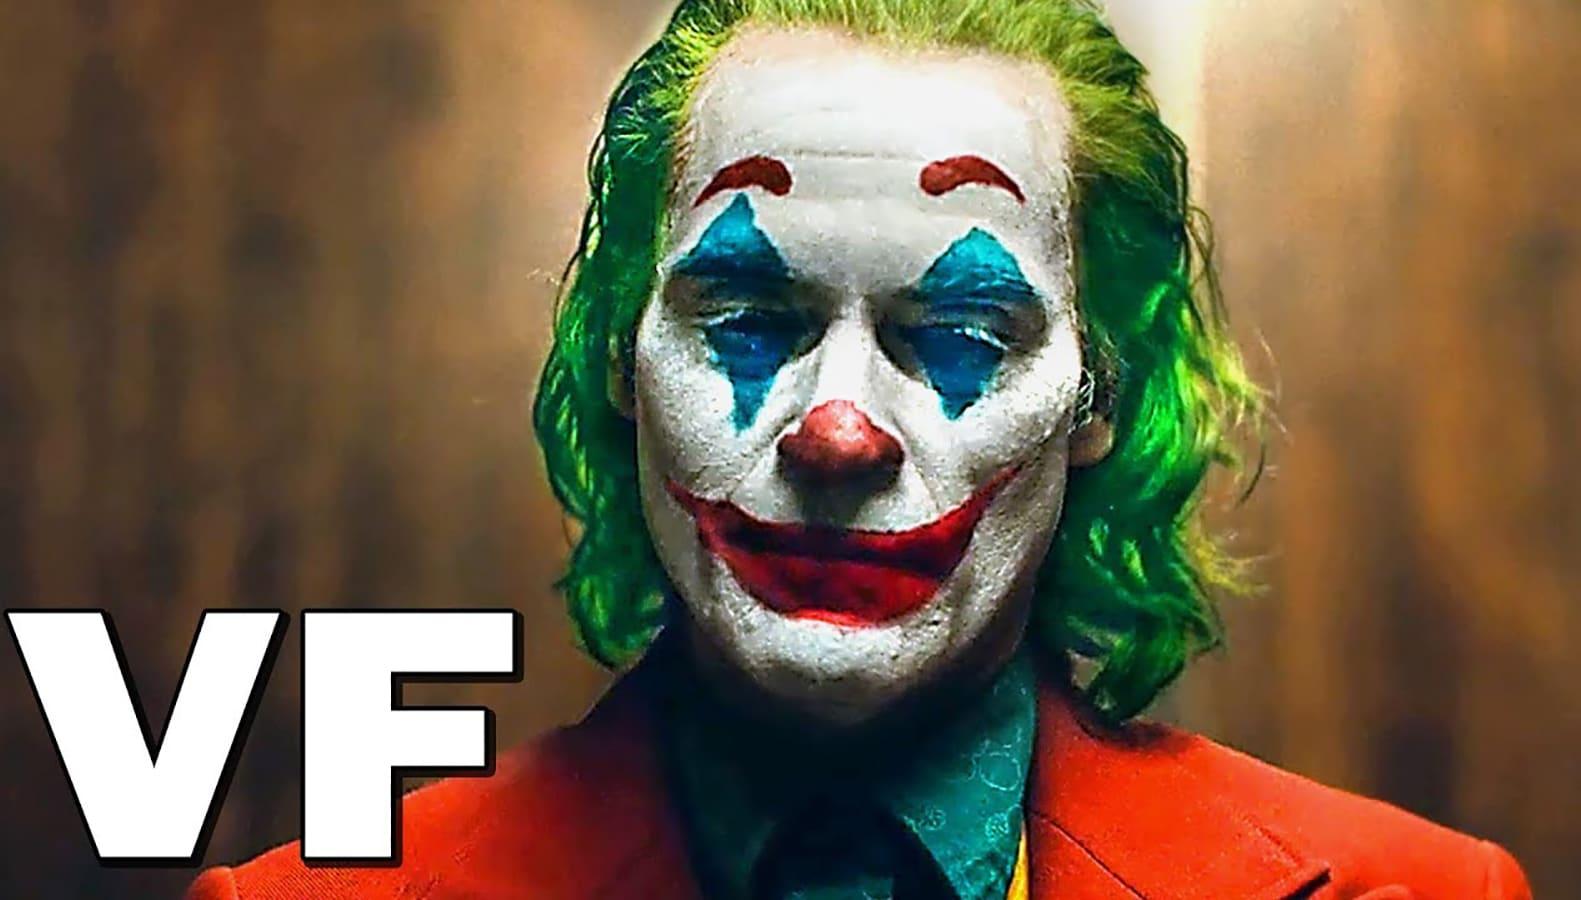 le Joker le film